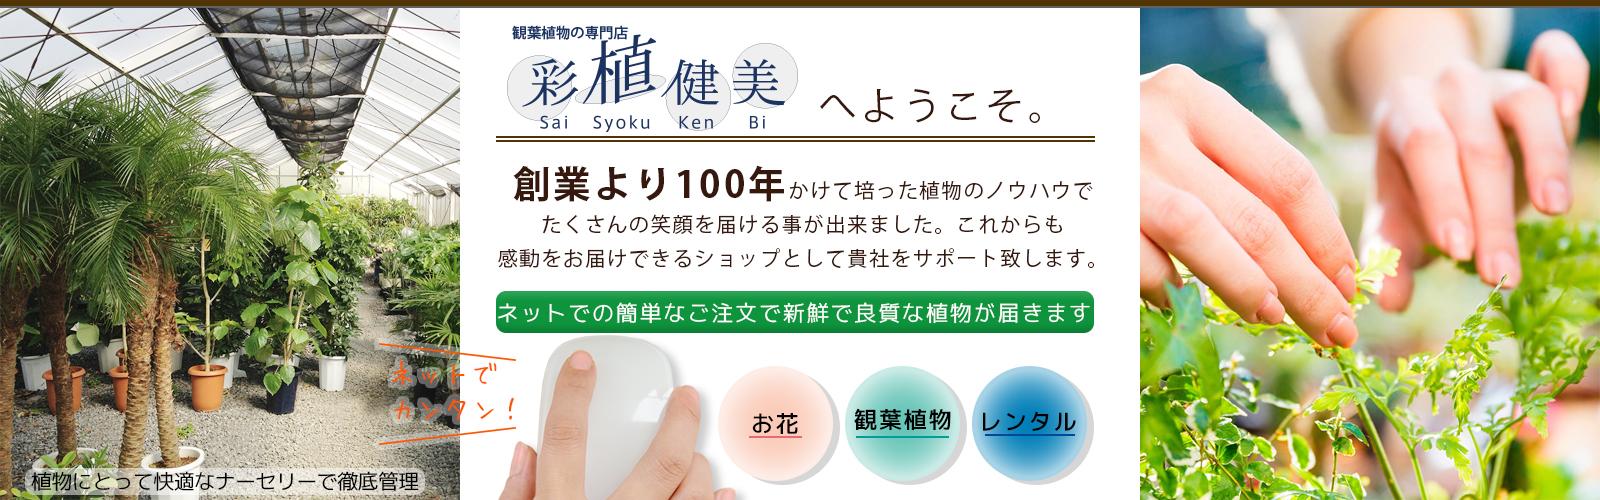 top_03_01.jpg